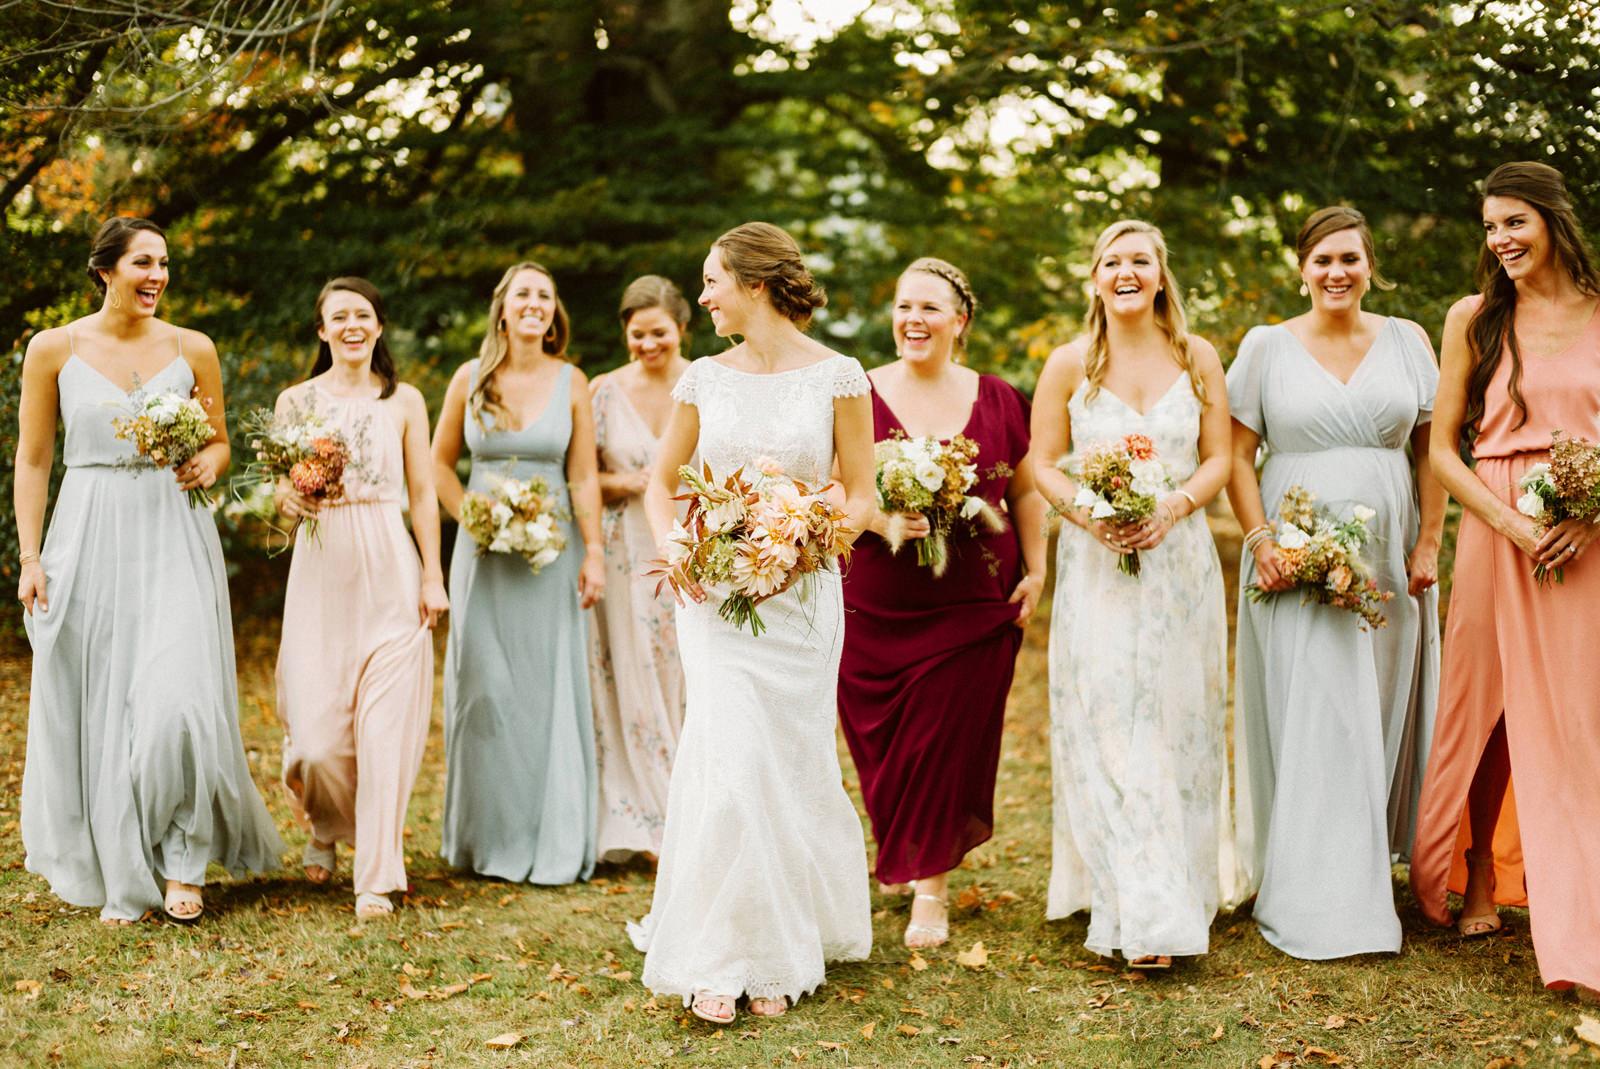 bridgeport-wedding-096 BRIDGEPORT, CONNECTICUT BACKYARD WEDDING